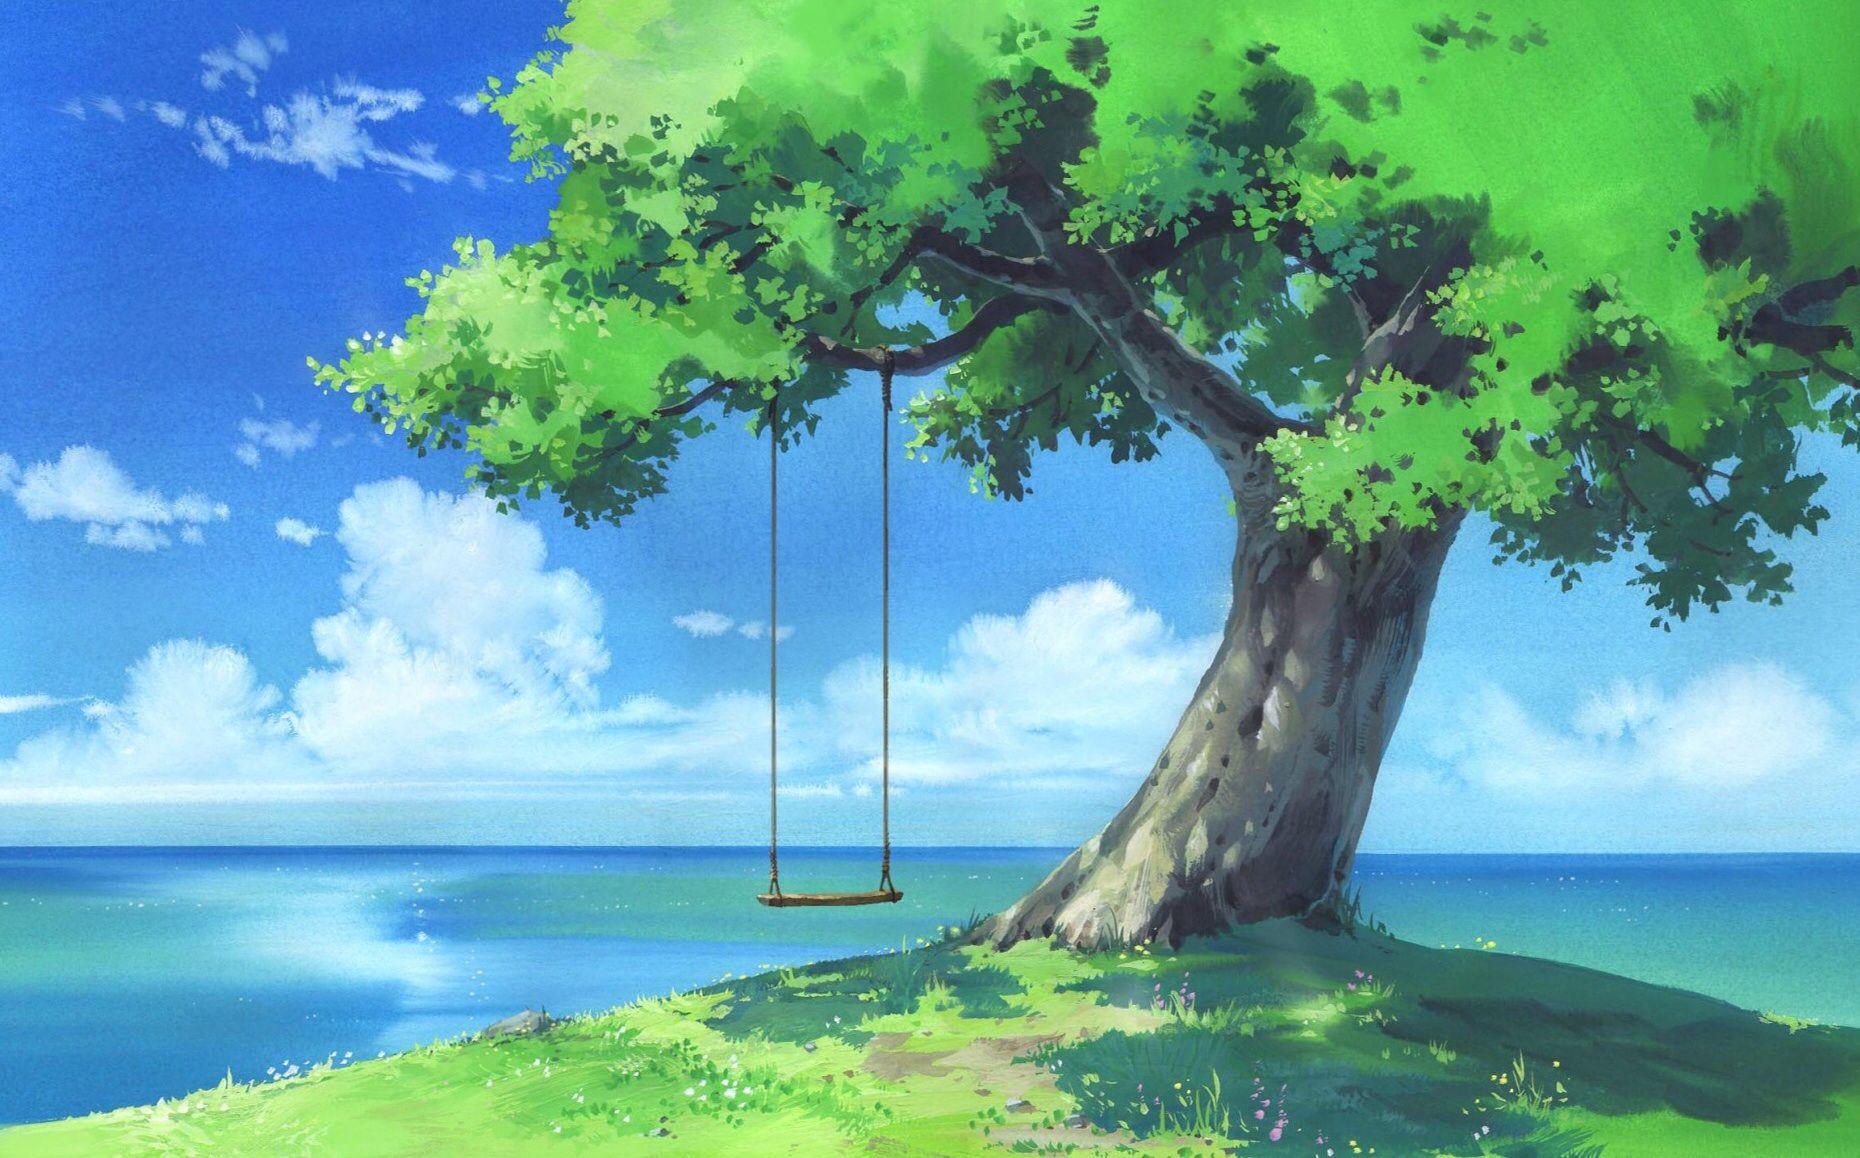 Latest 1860 1158 Anime Background Scenery Wallpaper Anime Scenery